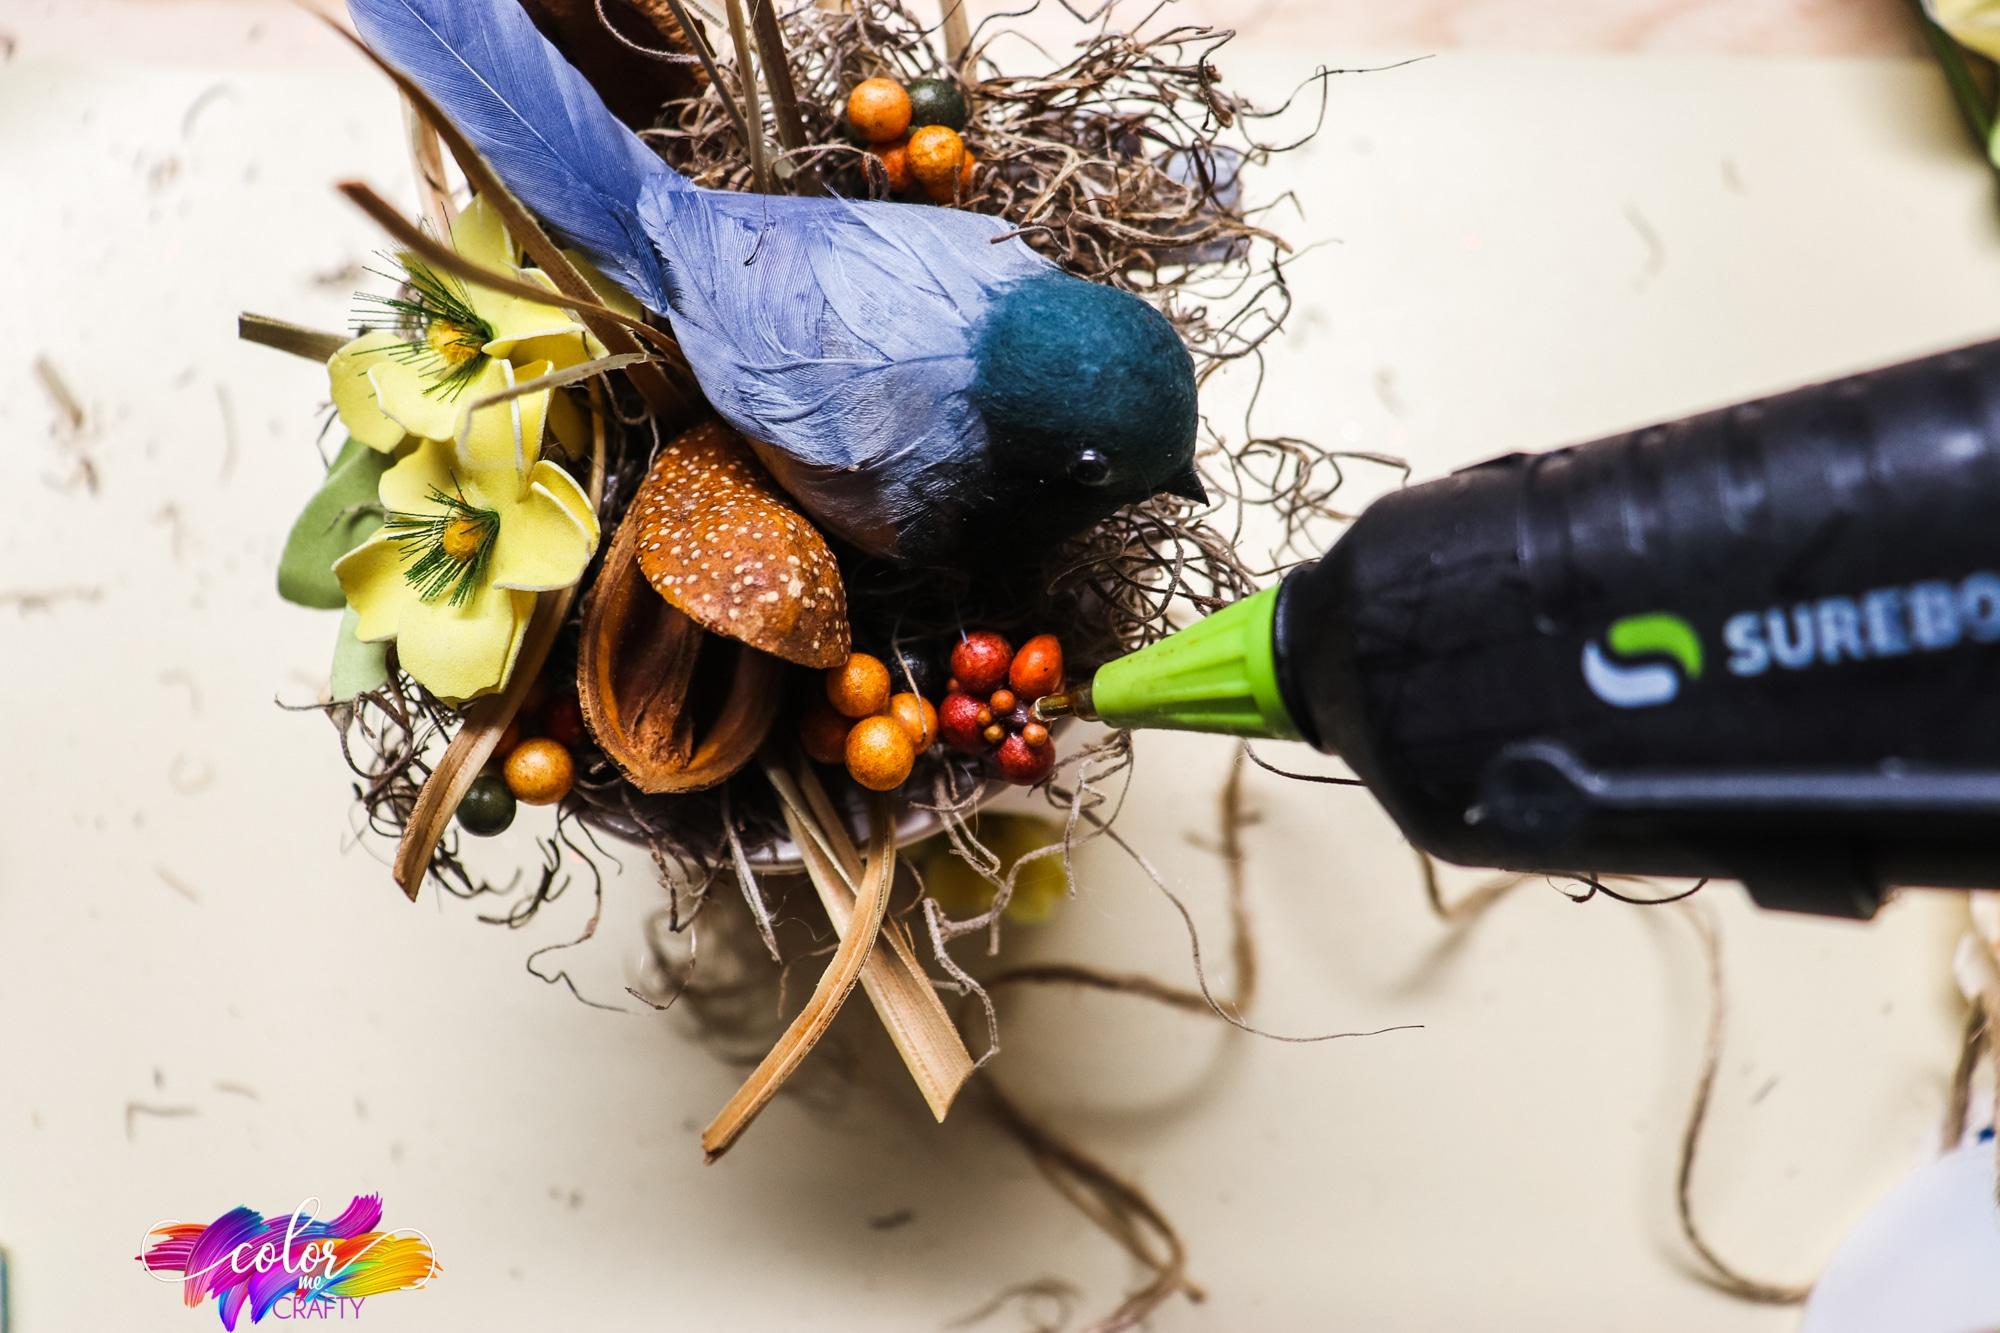 hot glue being applied to hold together DIY bird nest centerpiece